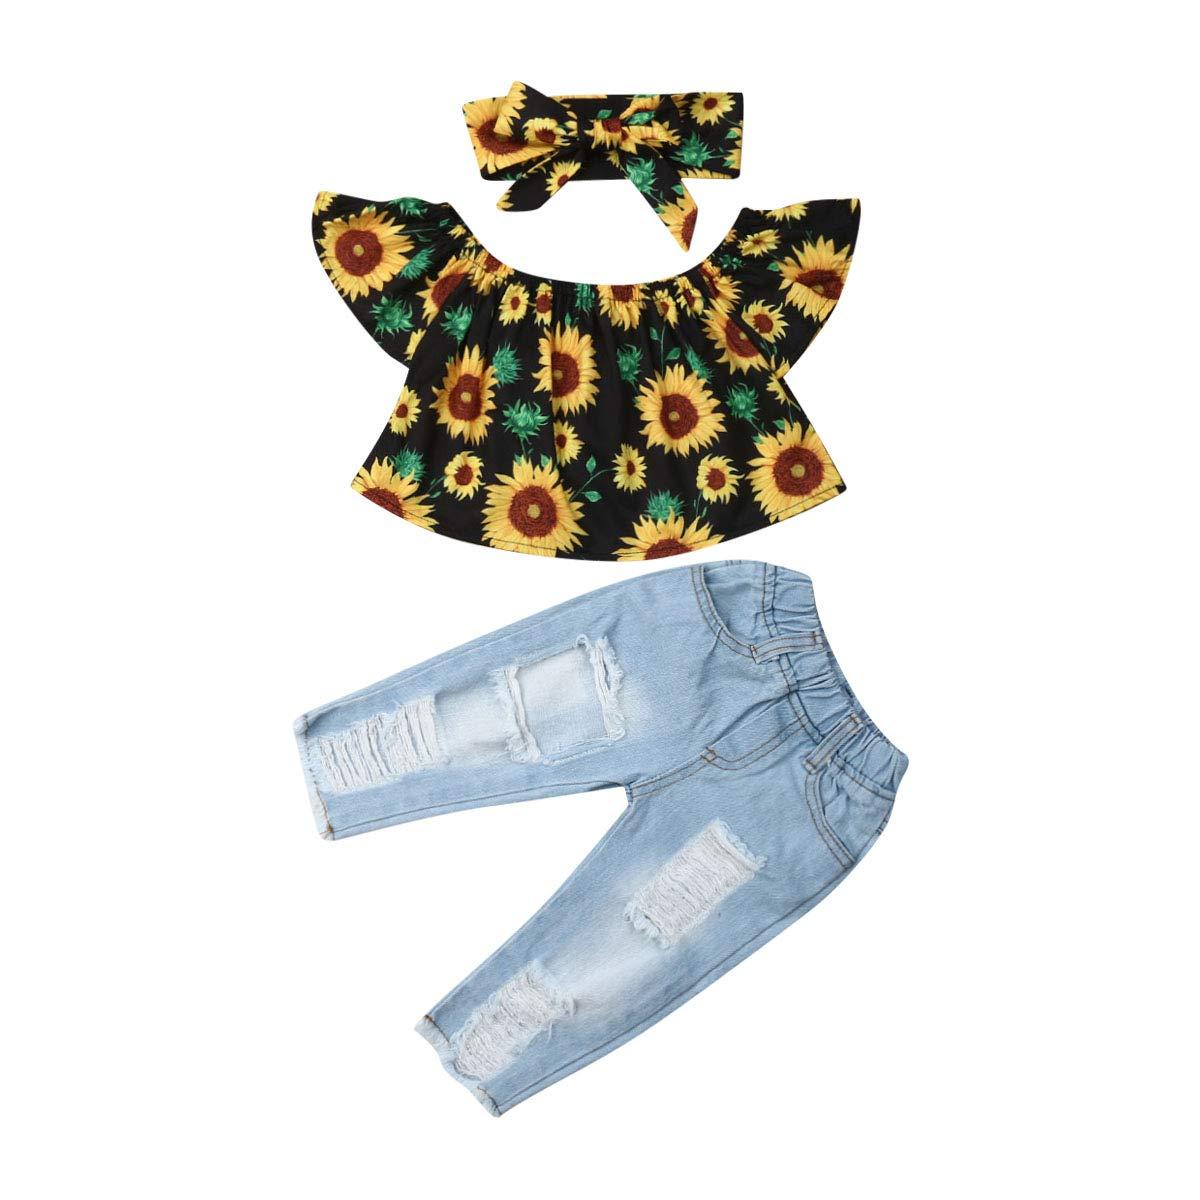 weiweizhipin Disfraz de Girasol para niñas pequeñas de la Marca ...